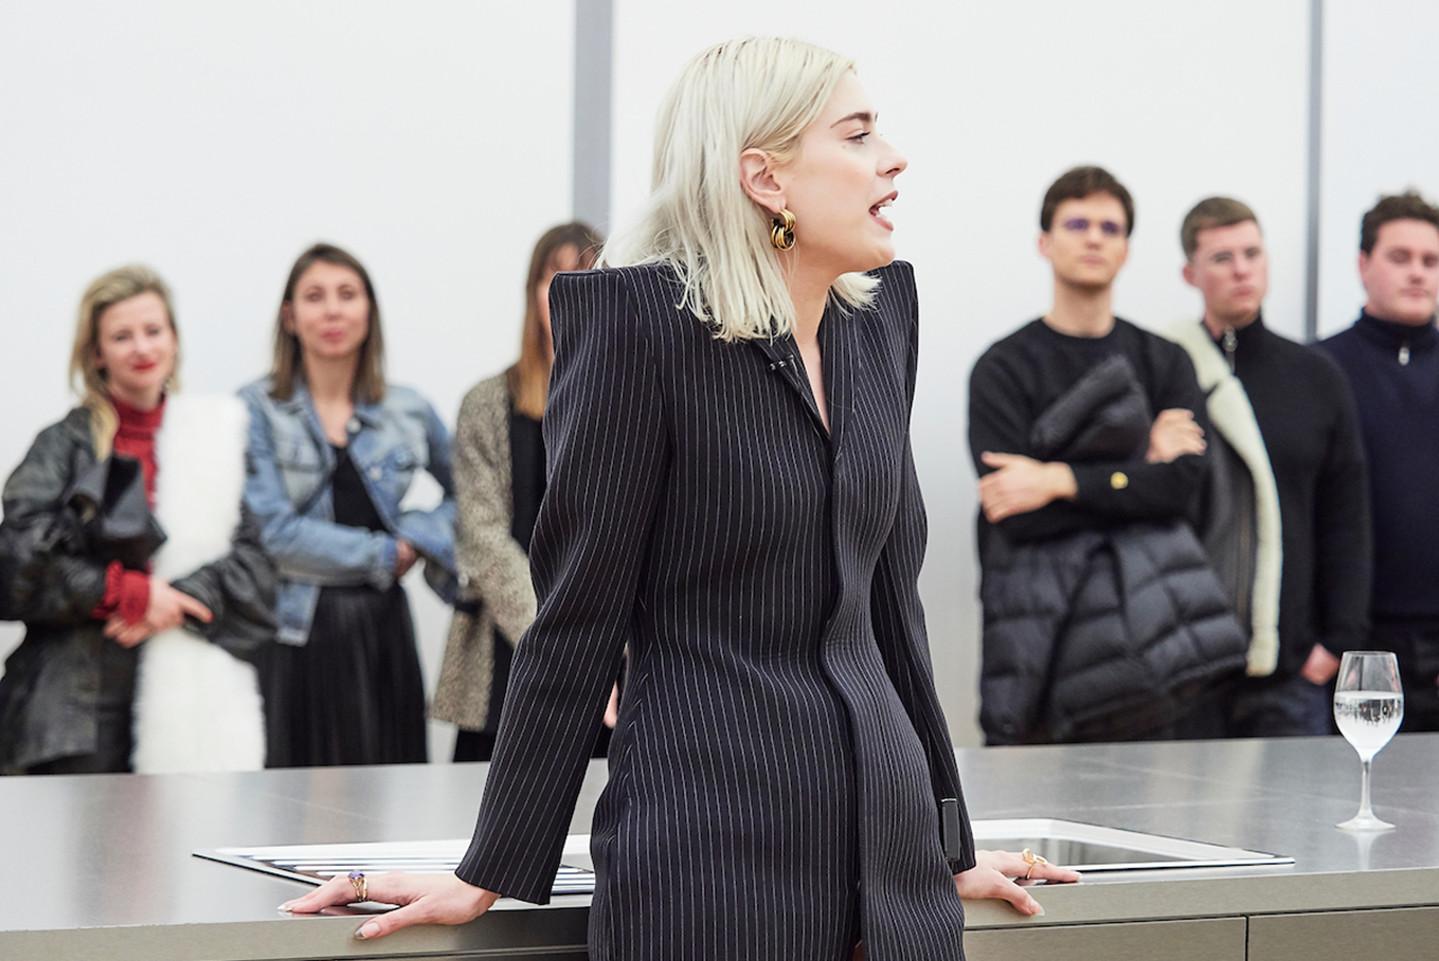 Nora Turato, the good, the bad and the viscose, 2019 © Kunstmuseum Liechtenstein. Photo: Miro Kuzmanovic